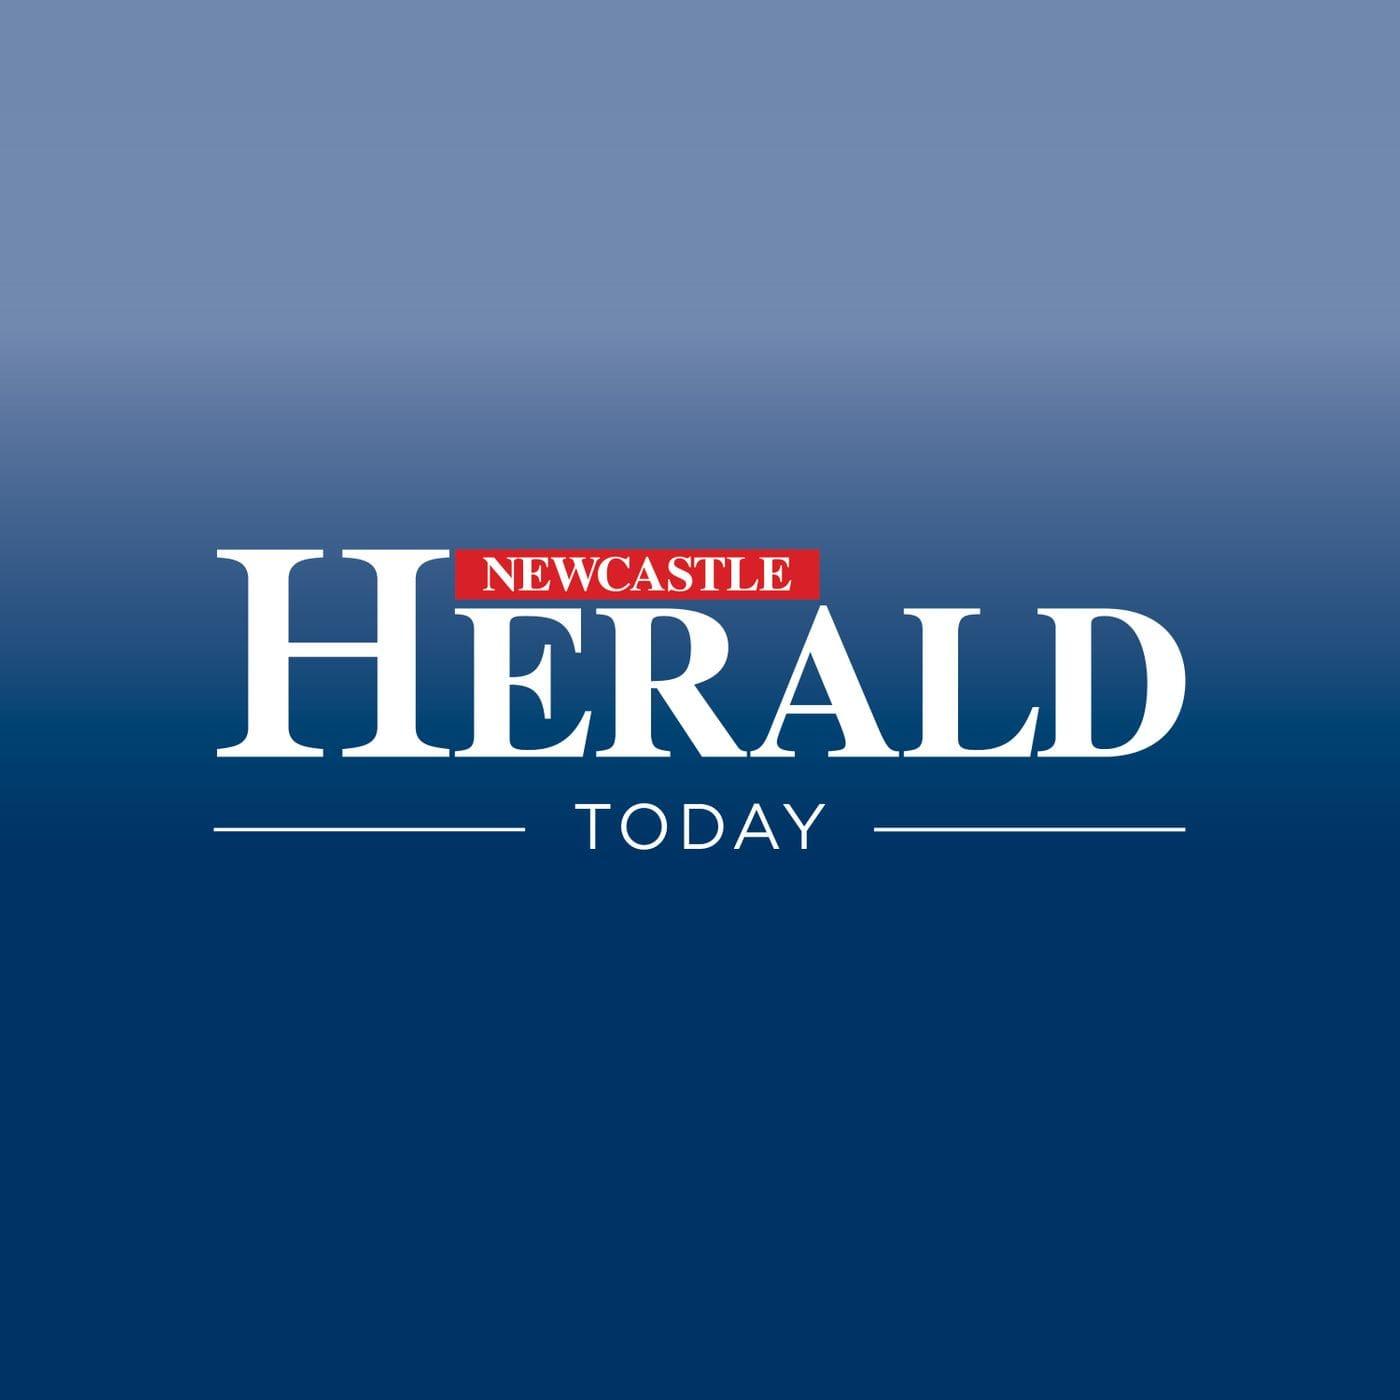 Newcastle Herald Today logo